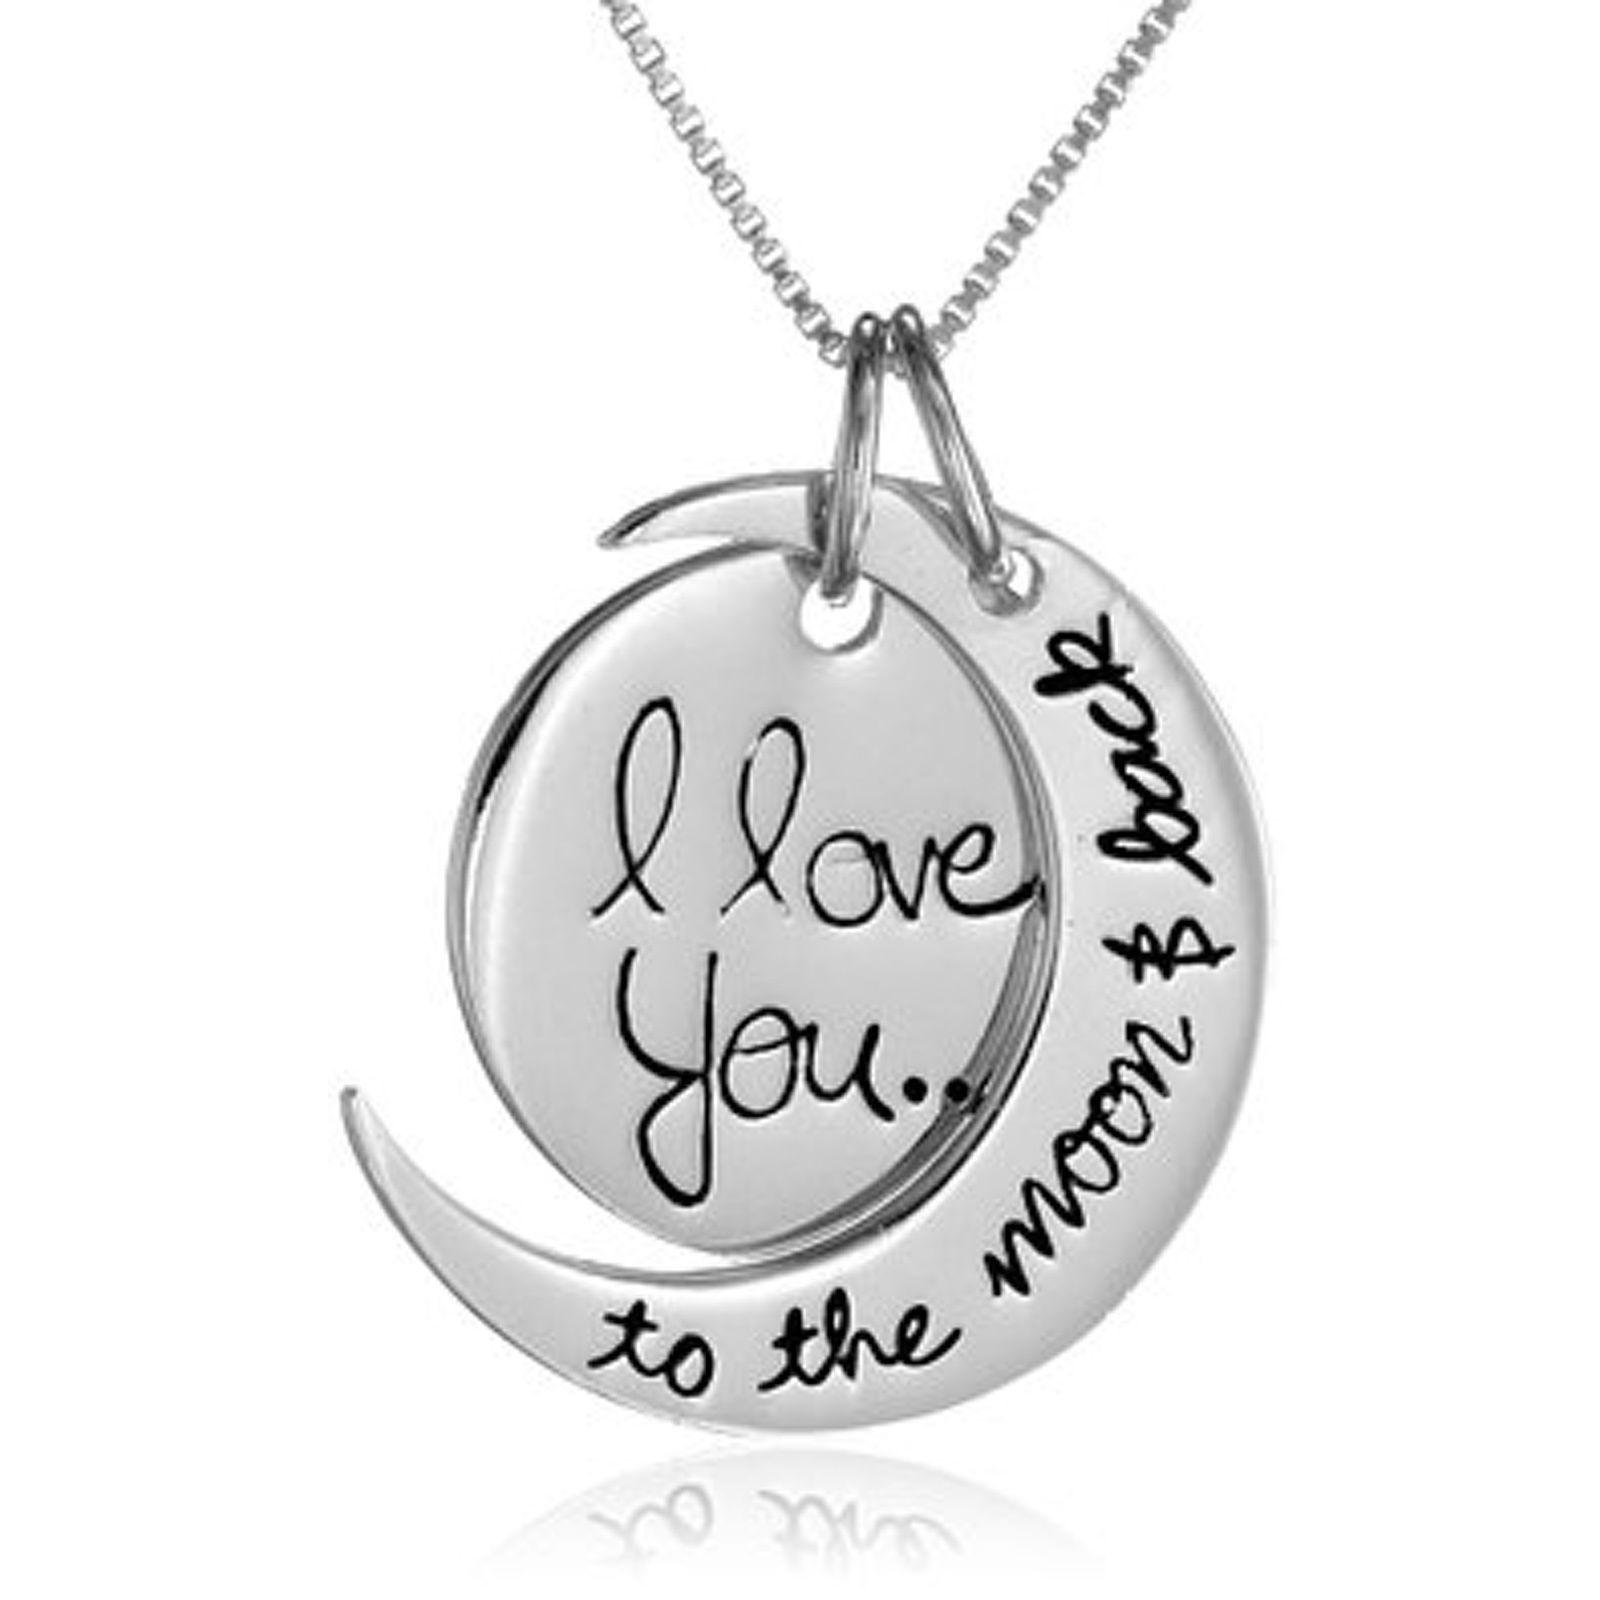 New Romantic Love Gift For Girlfriend Birthday Present Her Women